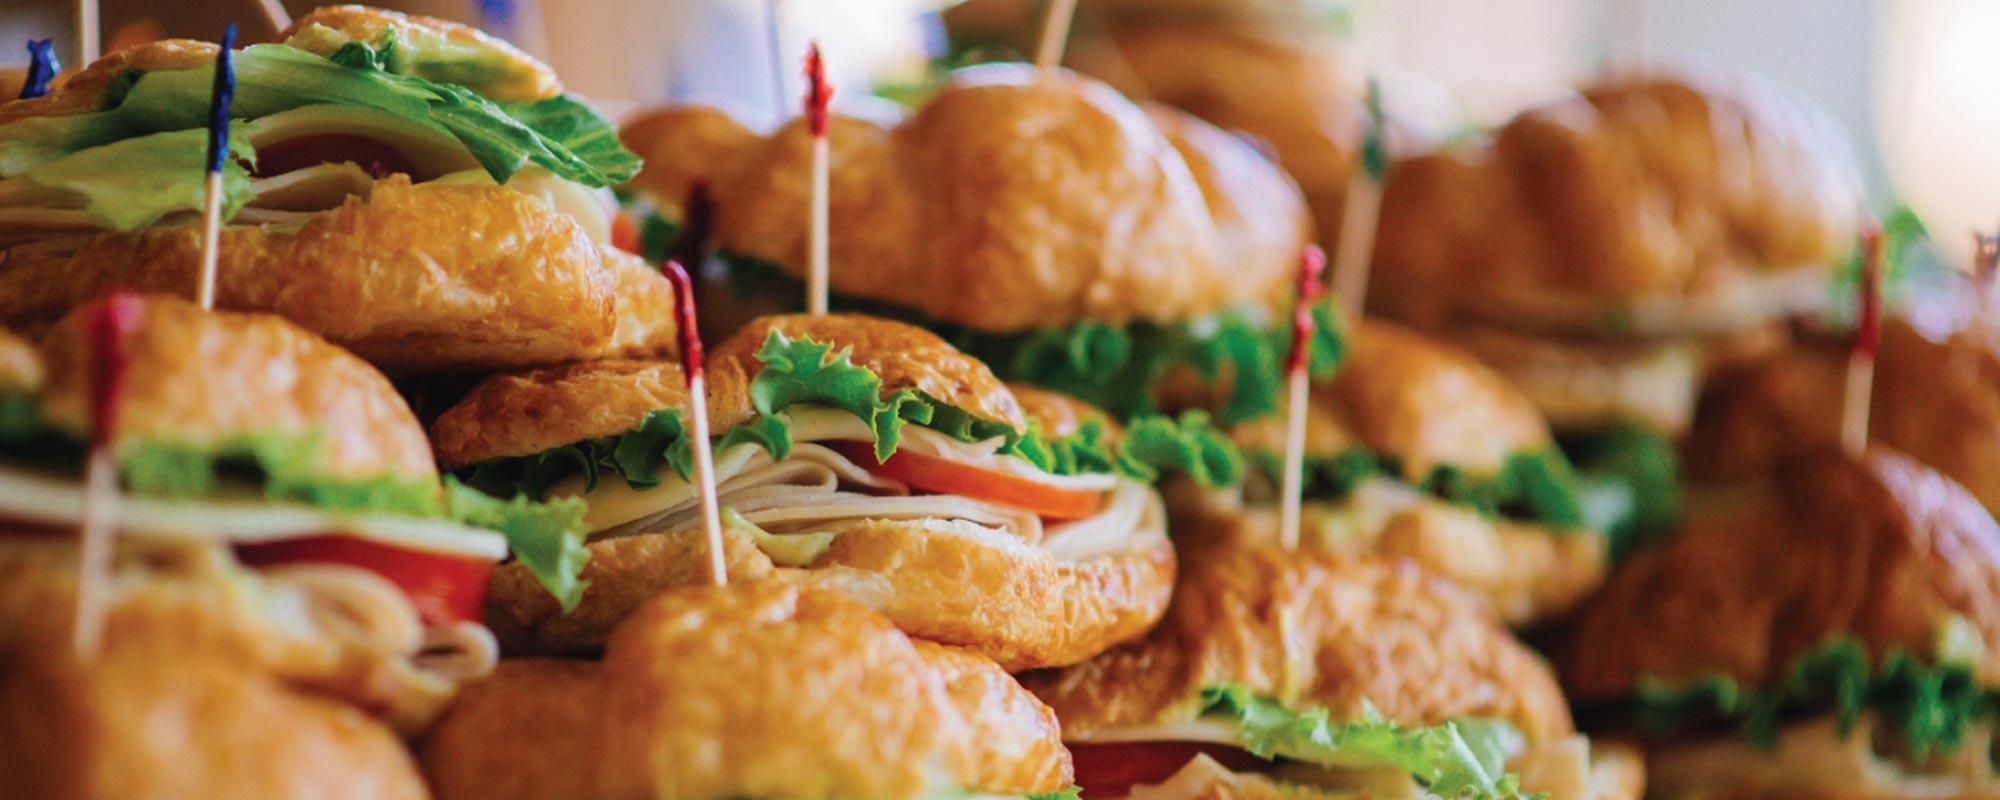 Sandwich party tray